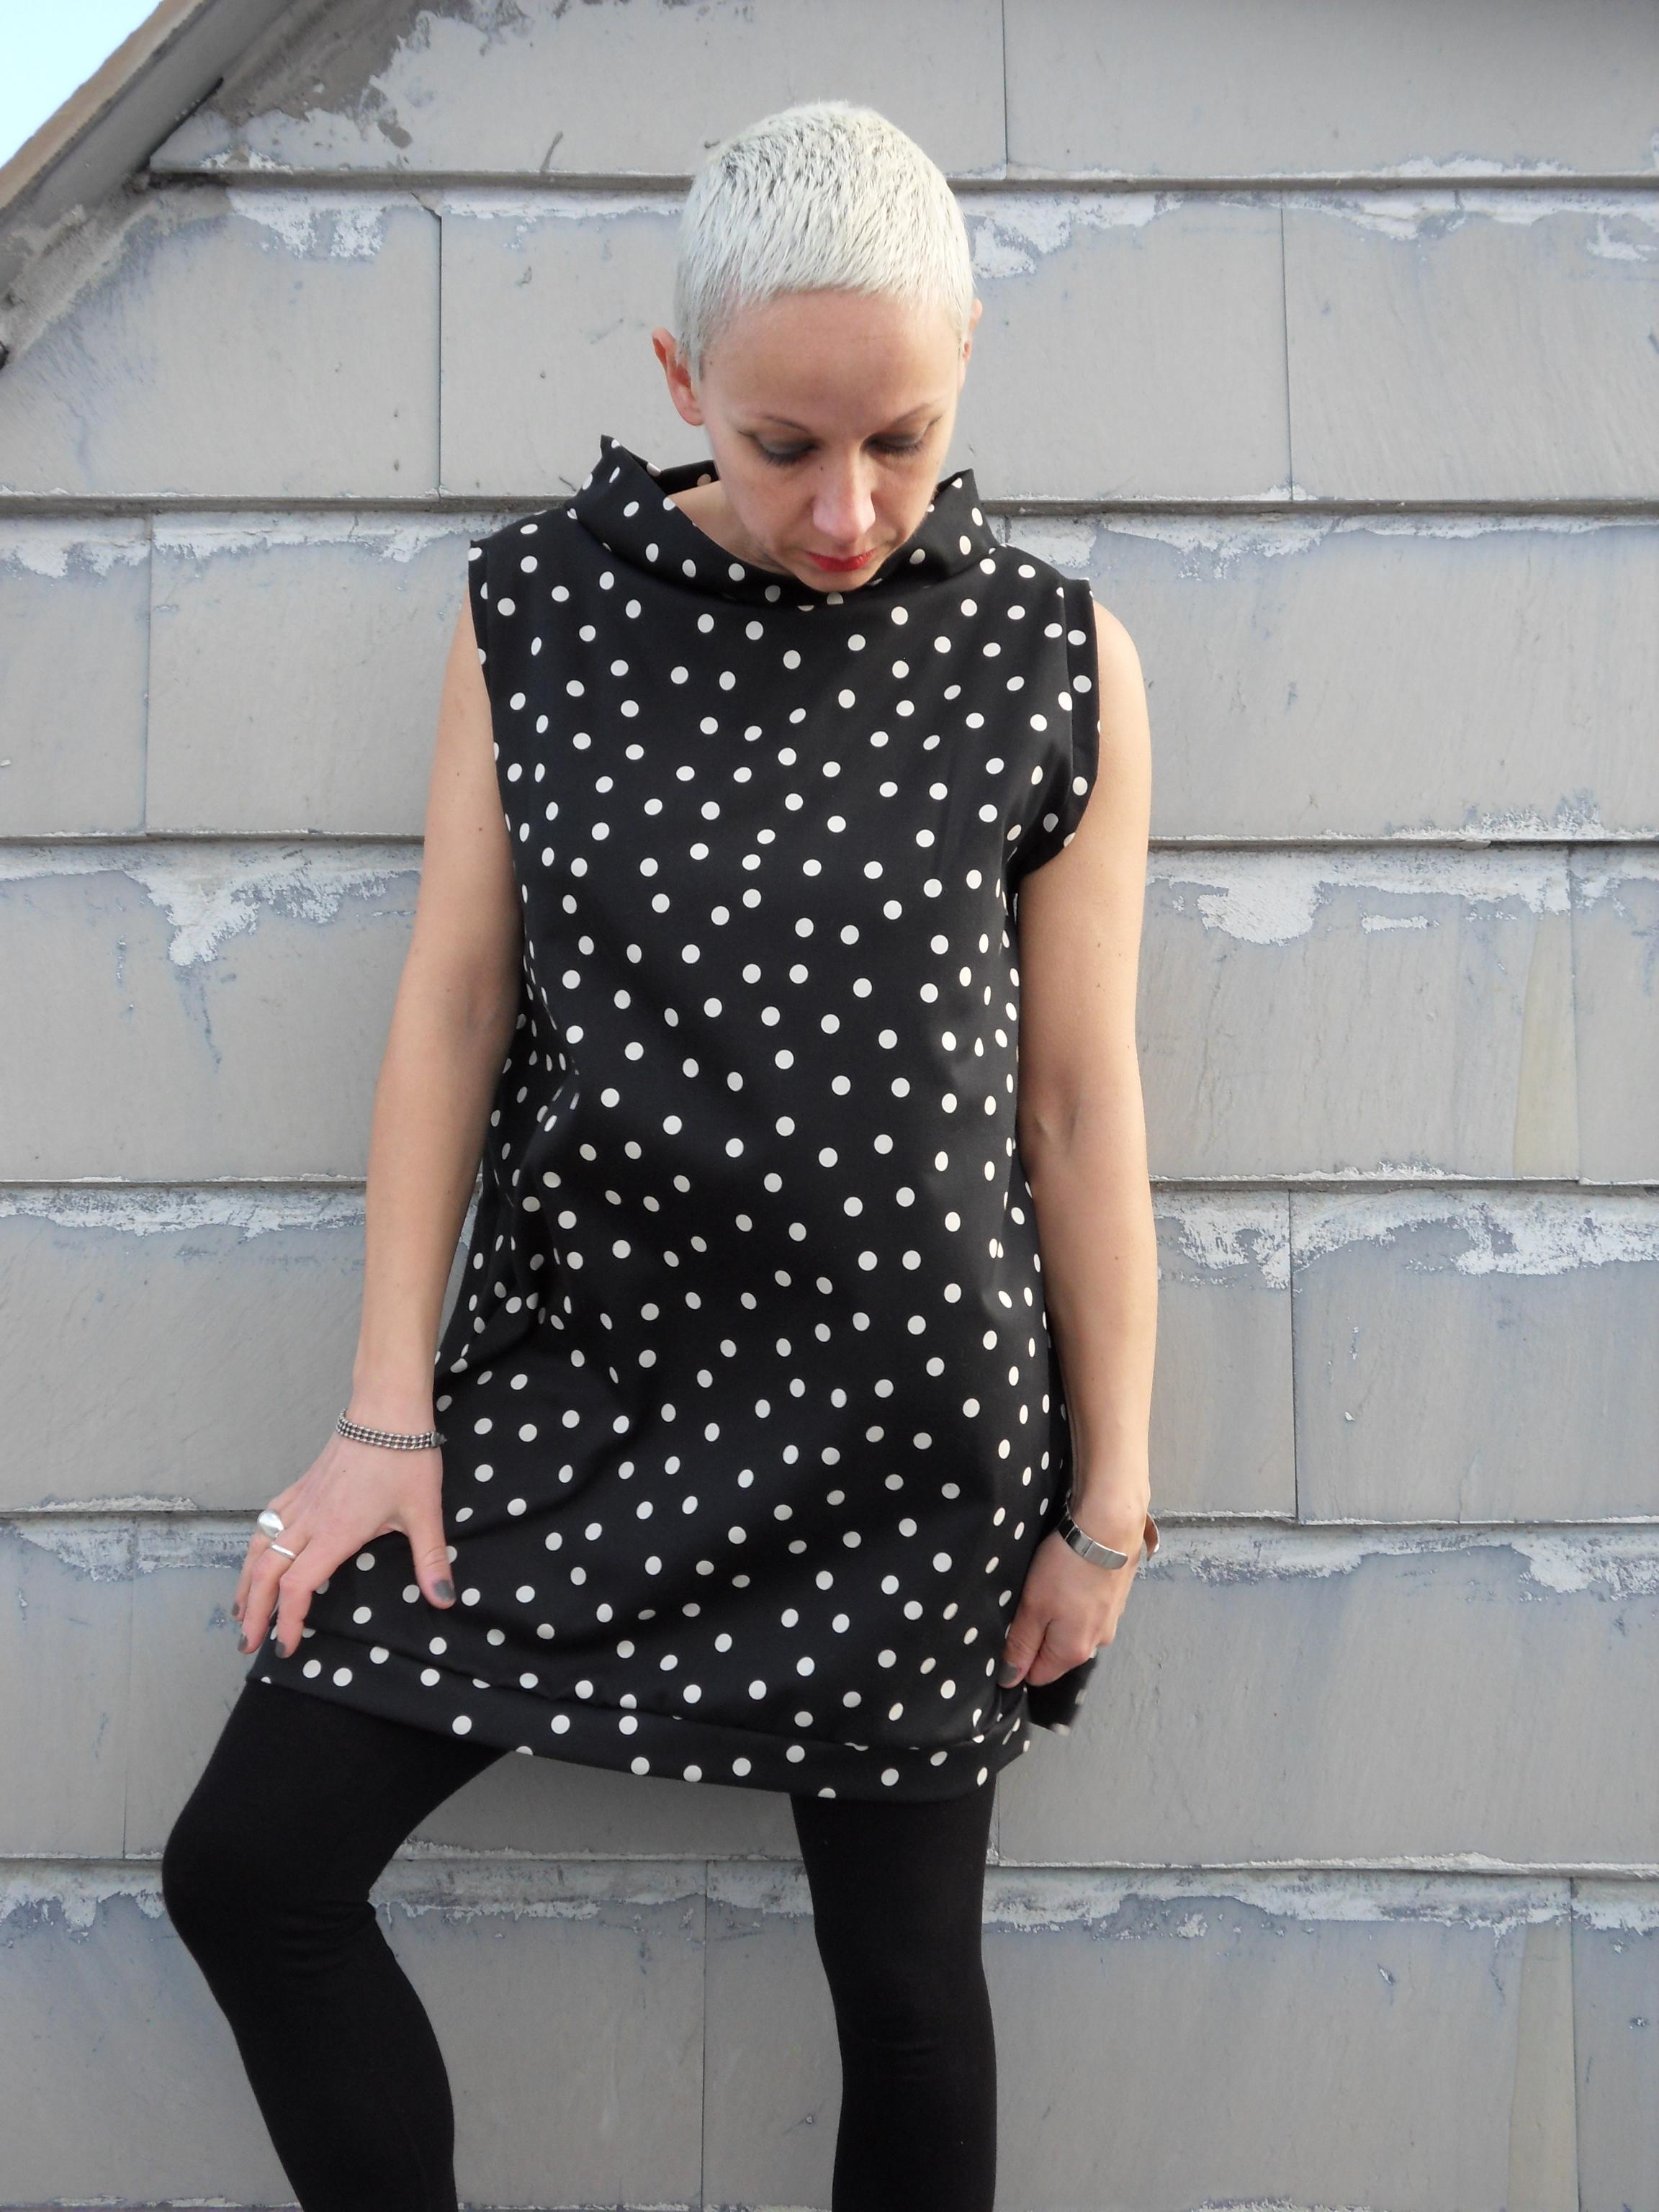 Polka dot women dress